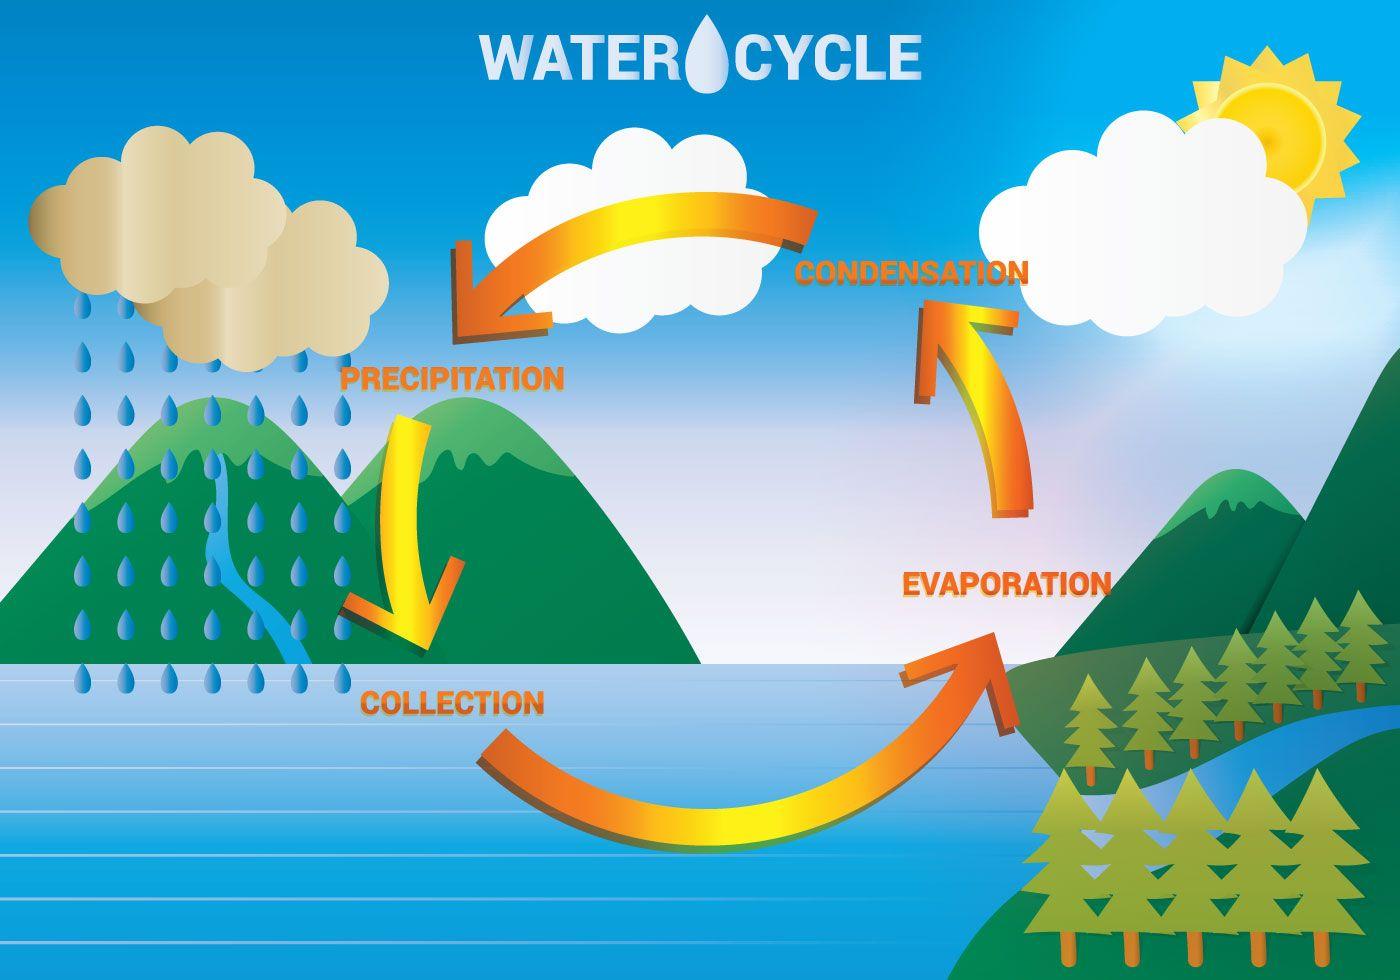 Water Cycle Diagram Vector Water Cycle Diagram Water Cycle